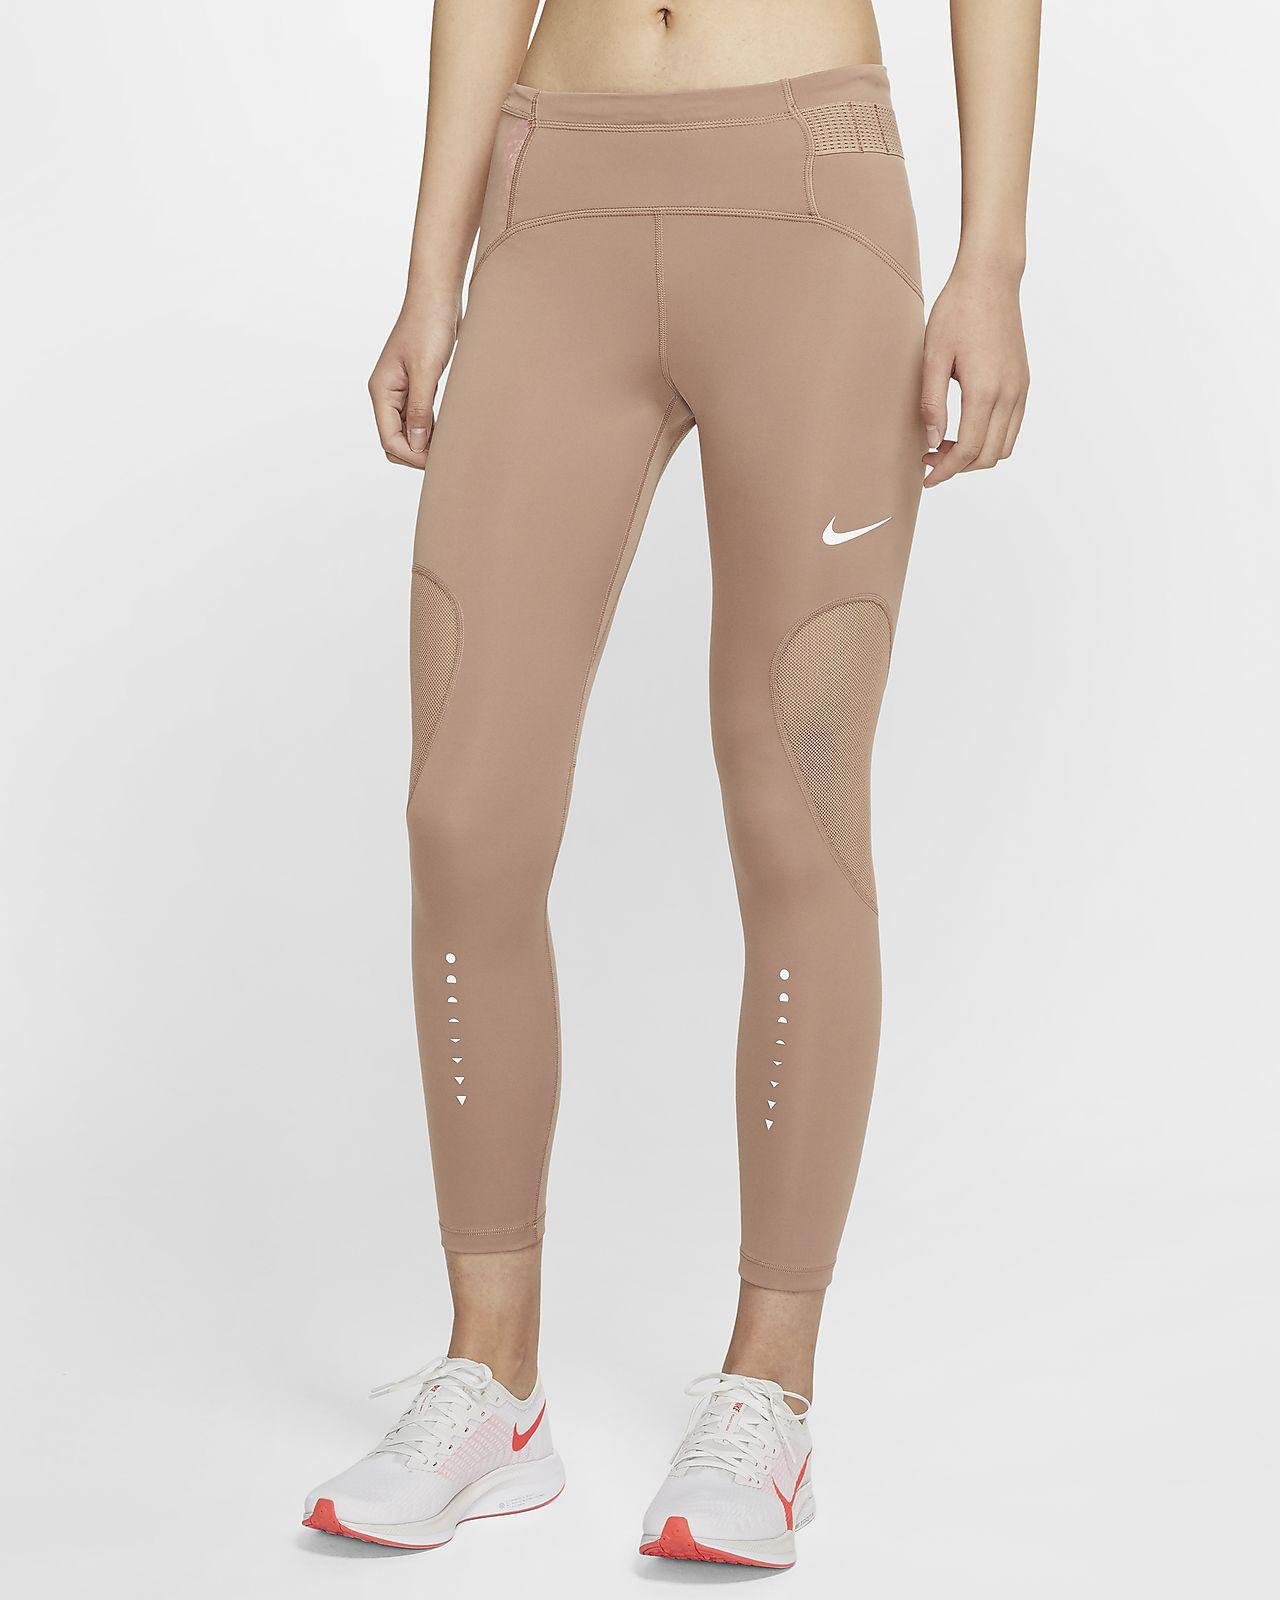 Nike Speed Icon Clash Women's 7/8 Running Tights